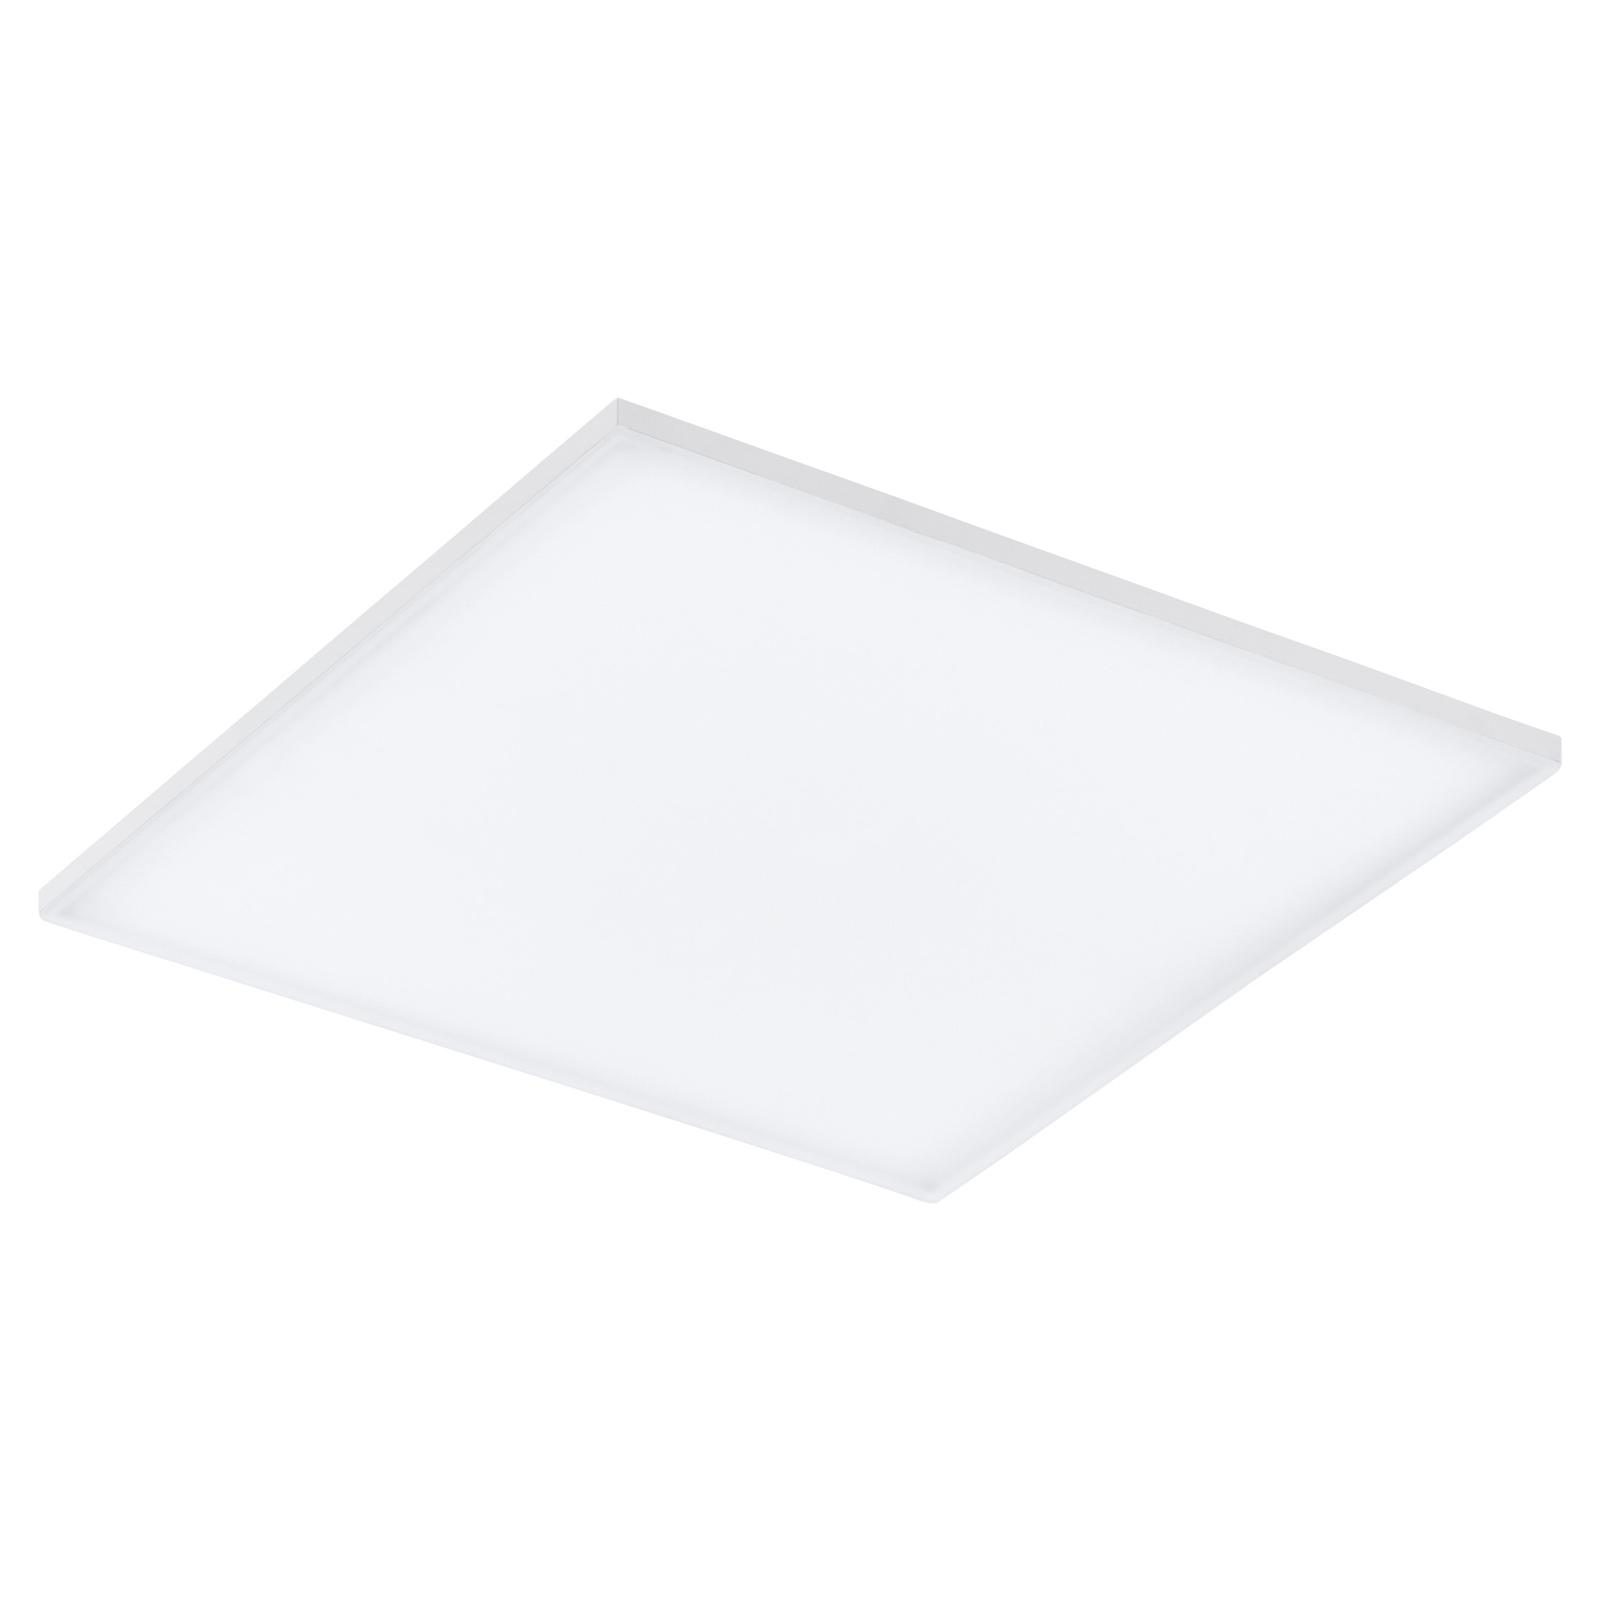 Lampa sufitowa LED Turcona, 59,5 x 59,5 cm